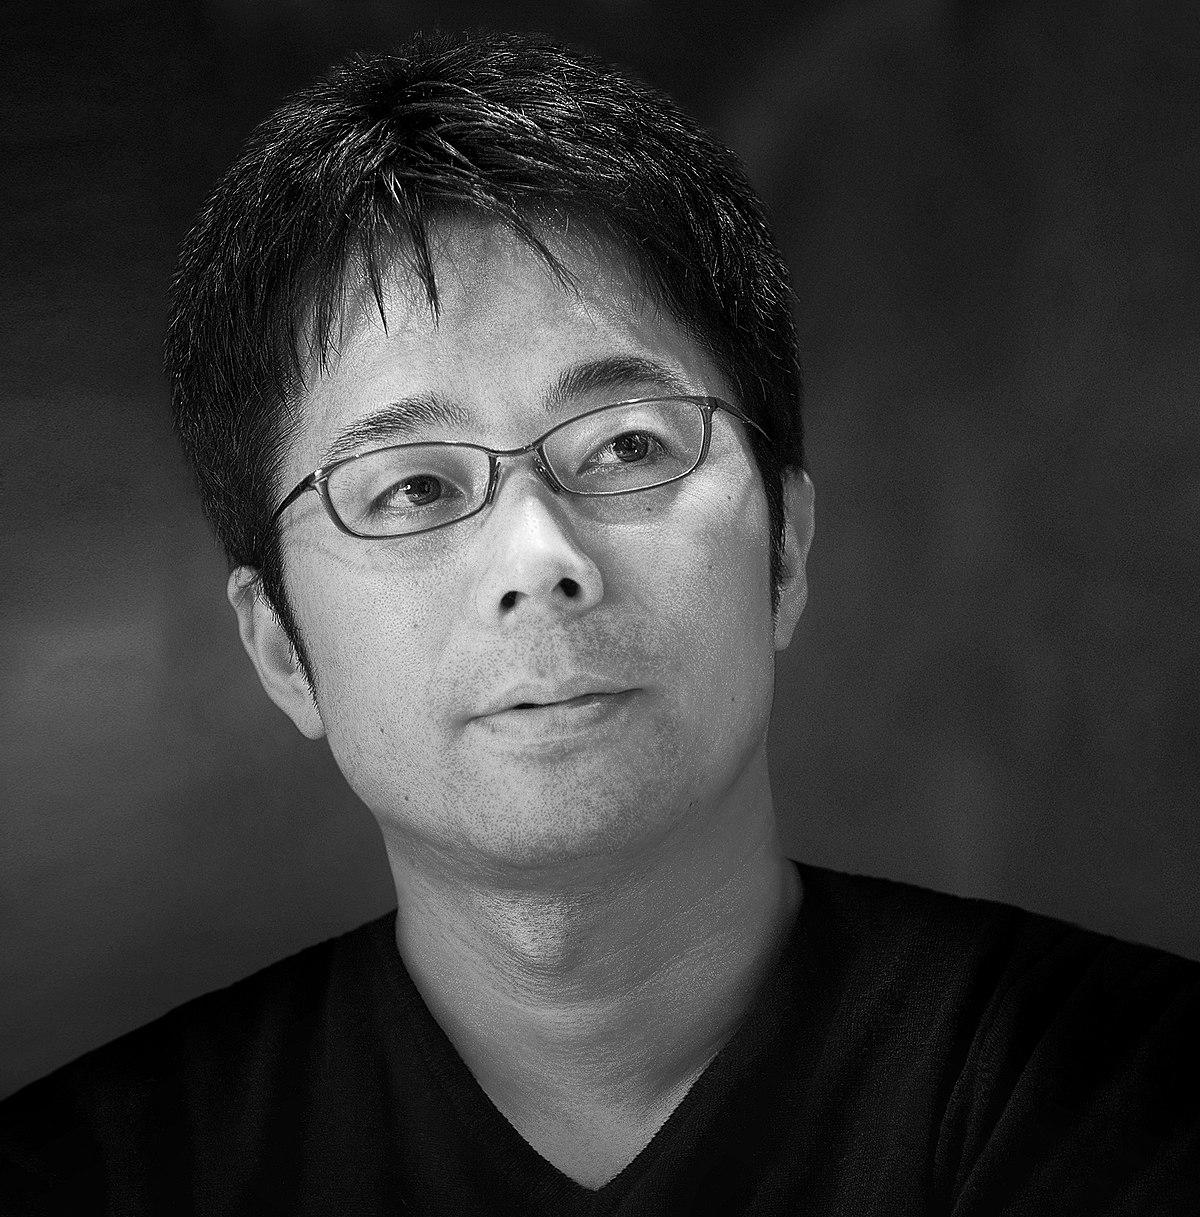 Tokujin yoshioka wikipedia for Tokujin yoshioka